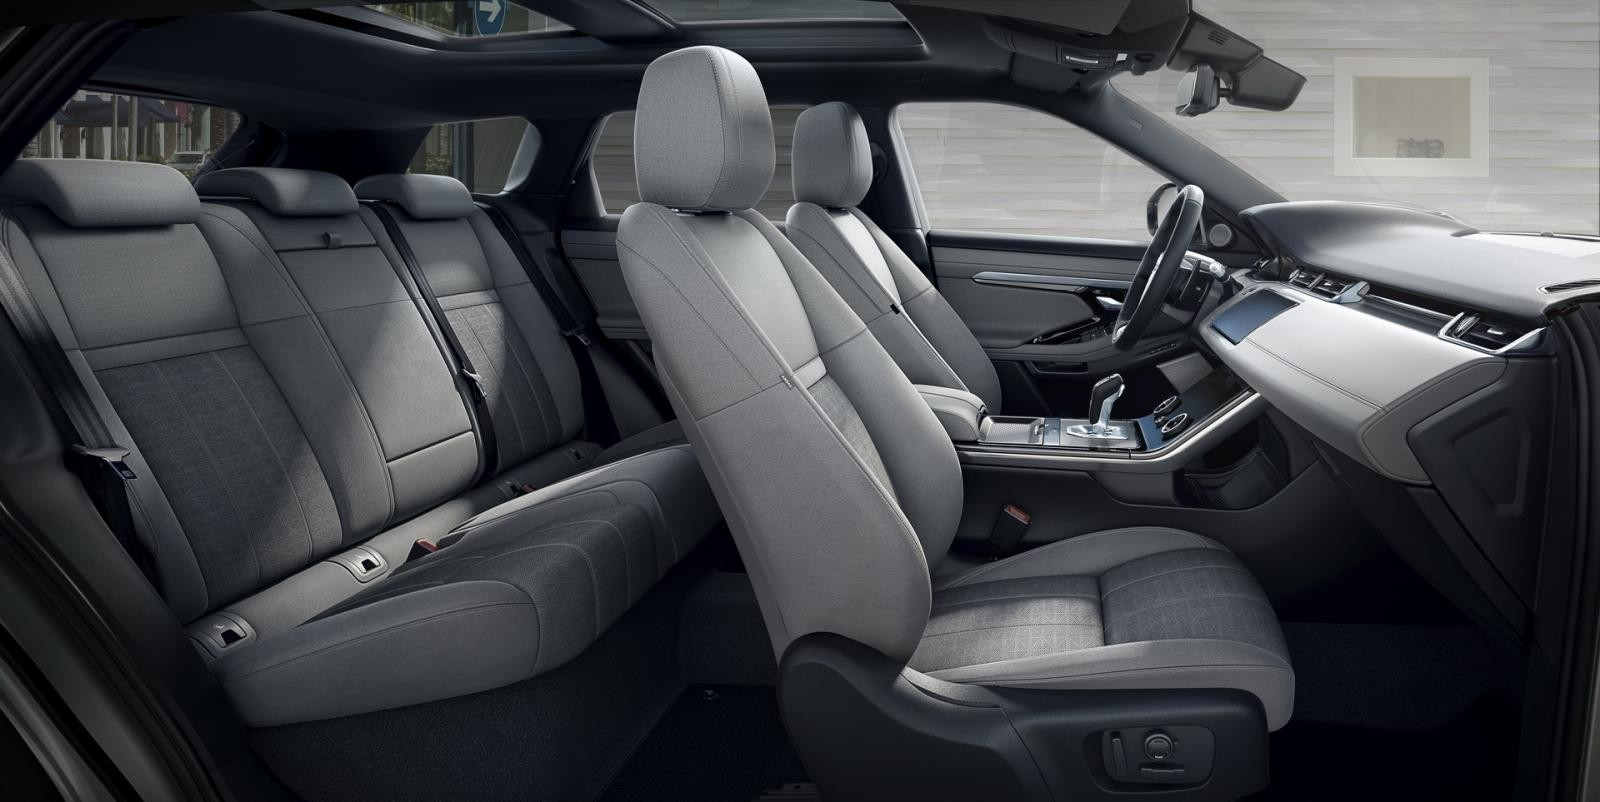 Nội thất bên trong Range Rover Evoque 2020